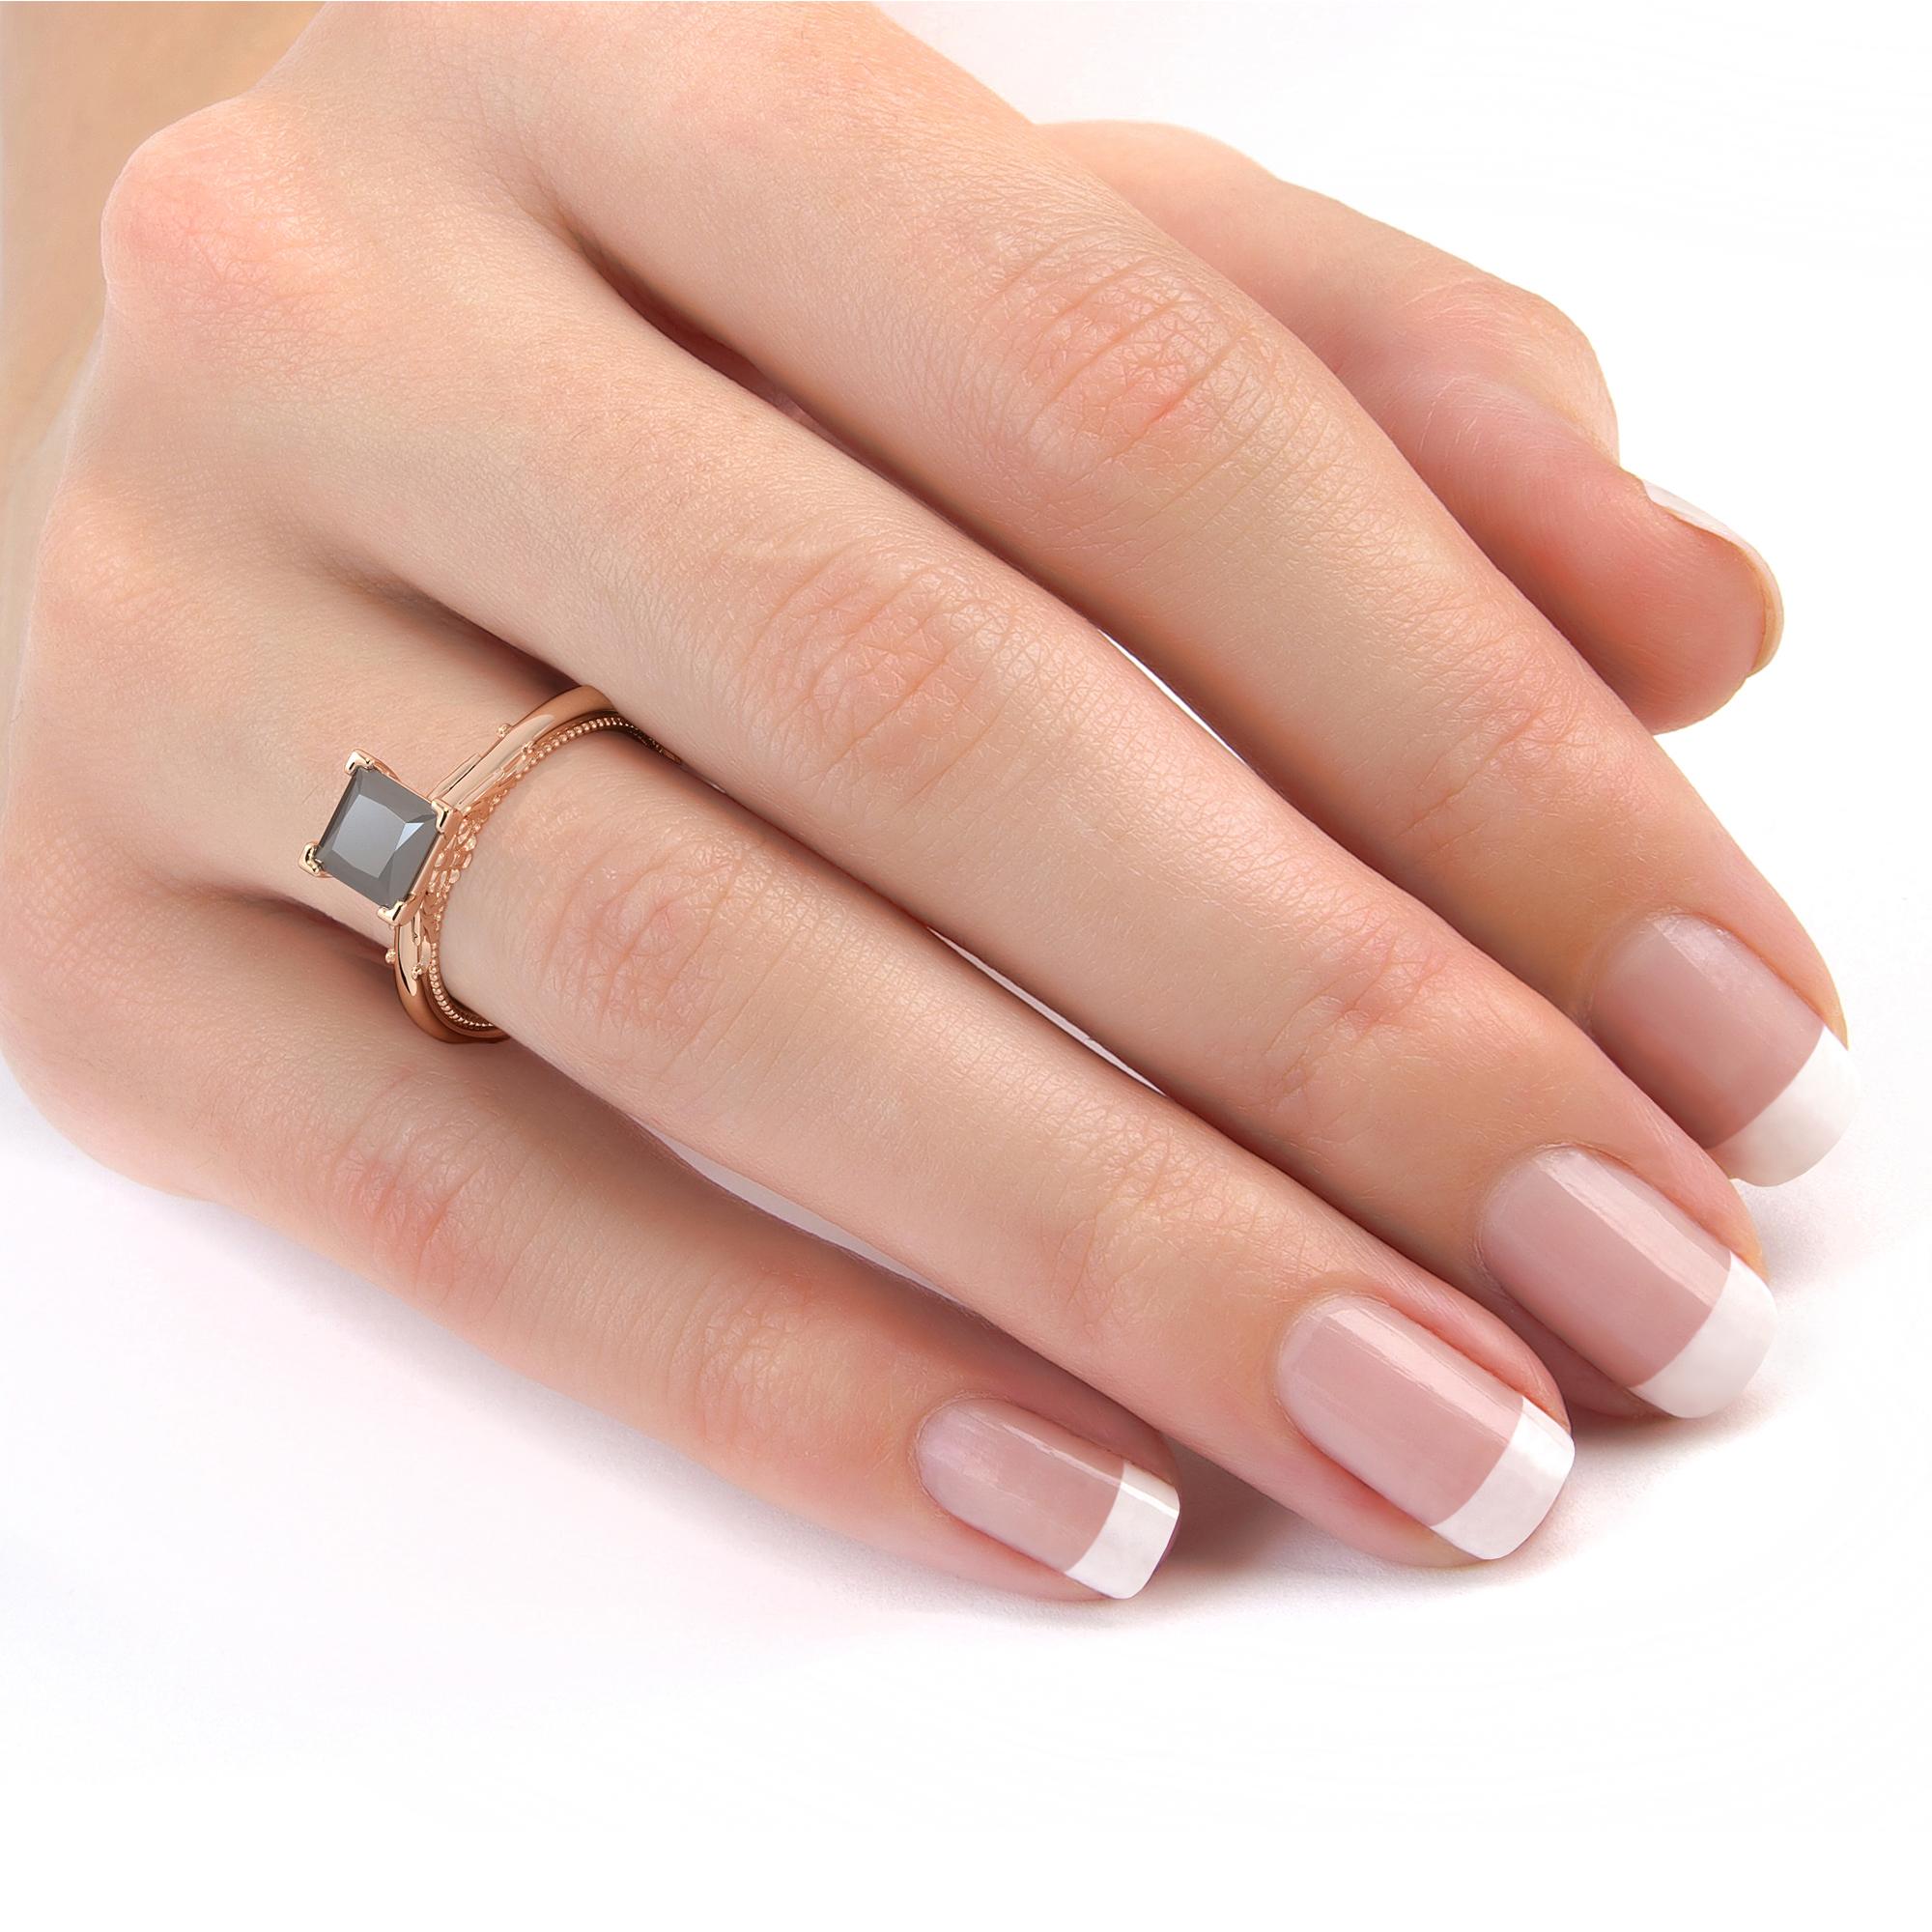 Black Diamond Victorian Engagement Ring Princess Cut Diamond Engagement Ring 14K Rose Gold Victorian Ring